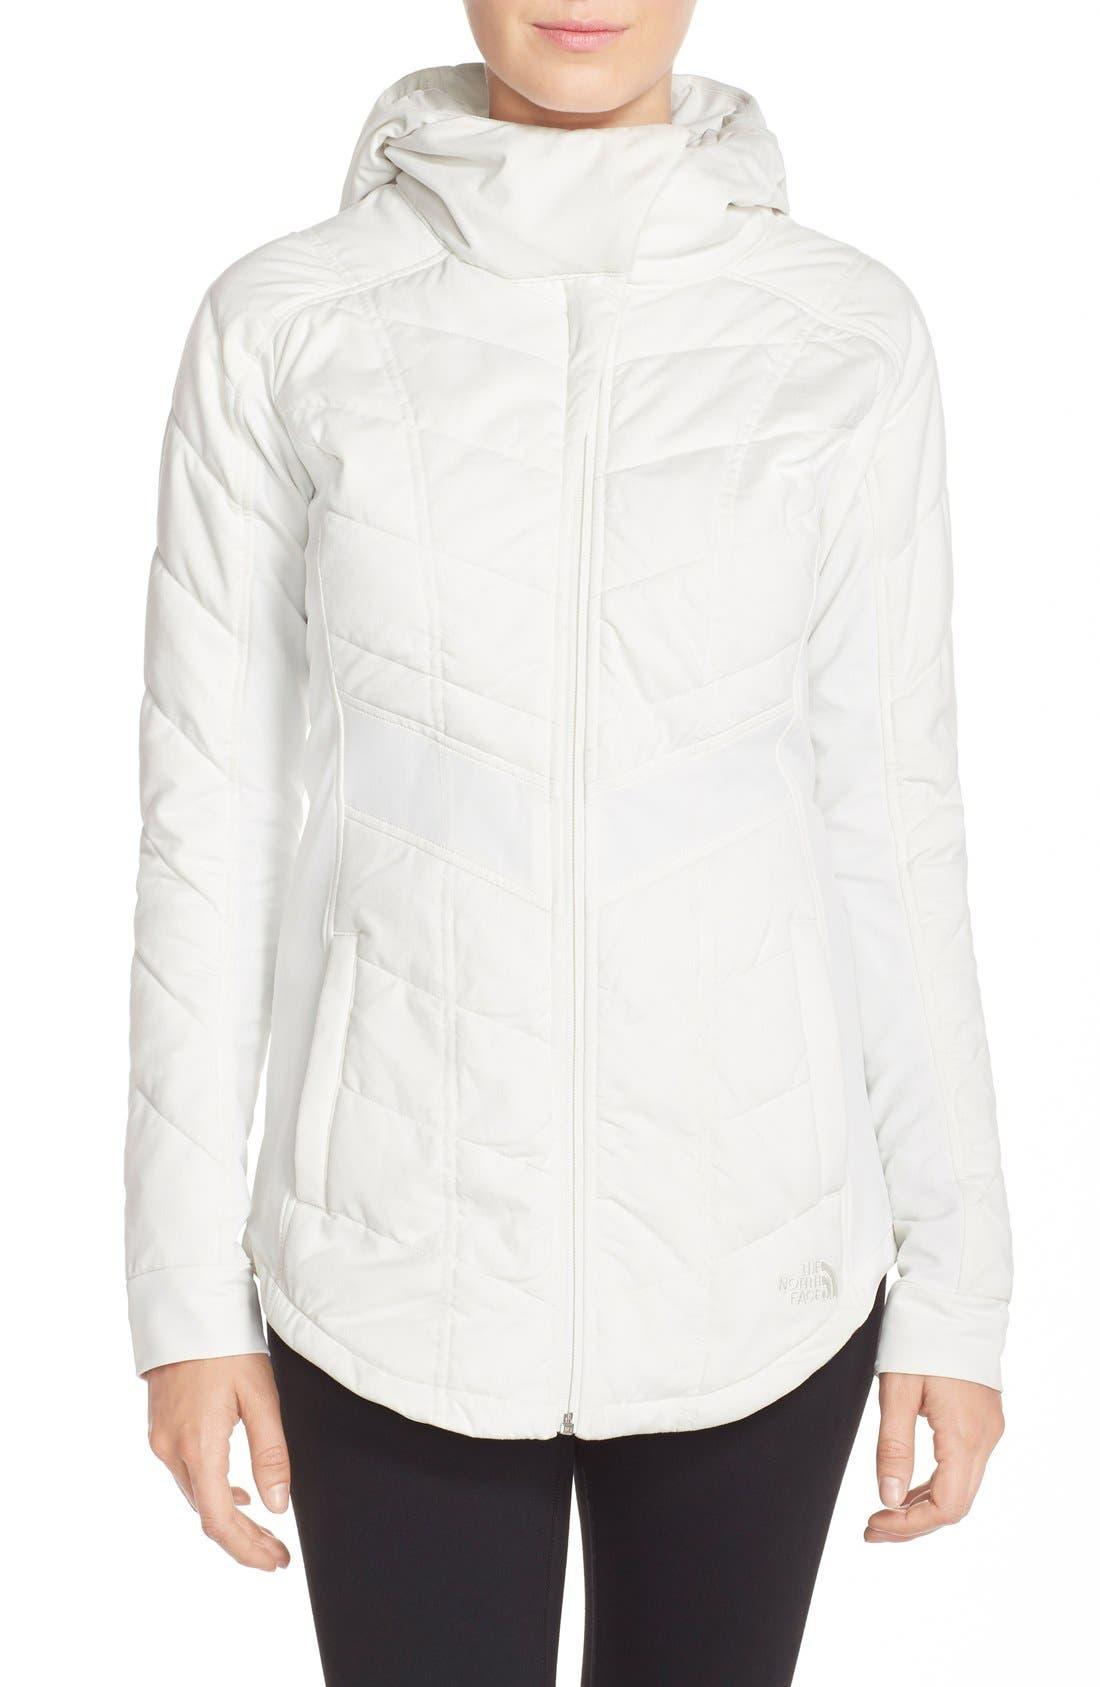 North face women's pseudio jacket